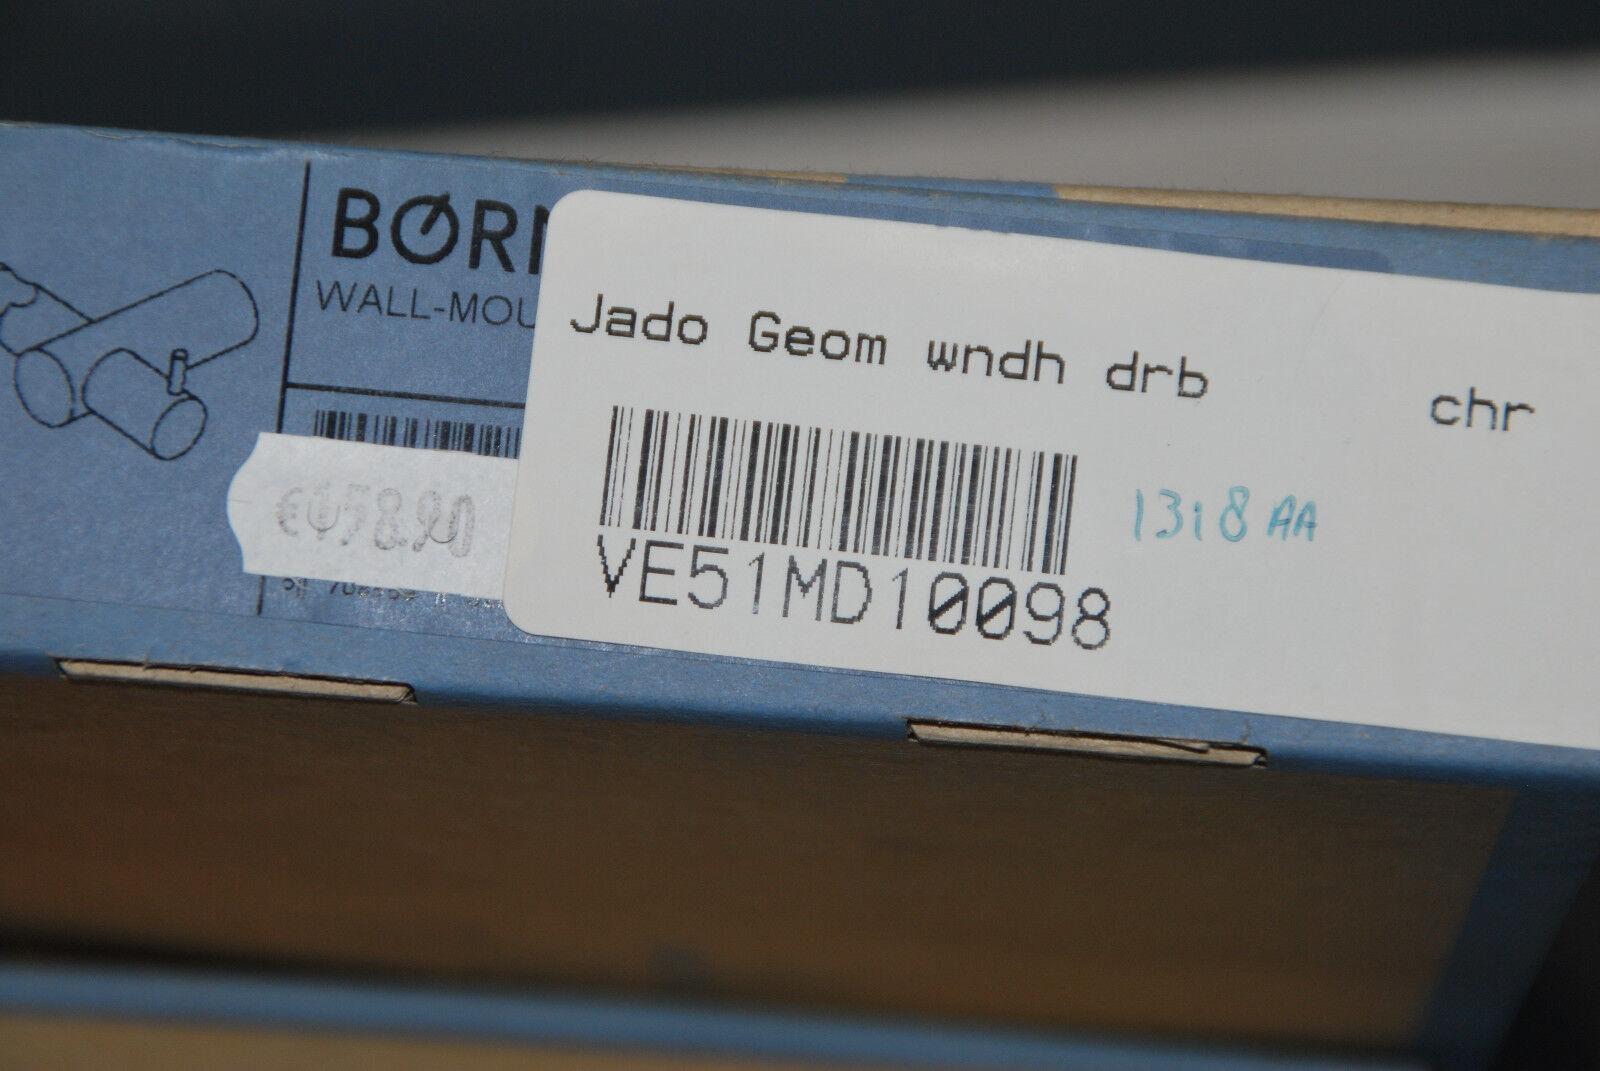 BORMA 1318AA DUSCHHALTERUNG CHROM SCHWENKBAR JADO GEOMETRY F1318AA MASSIV NEU